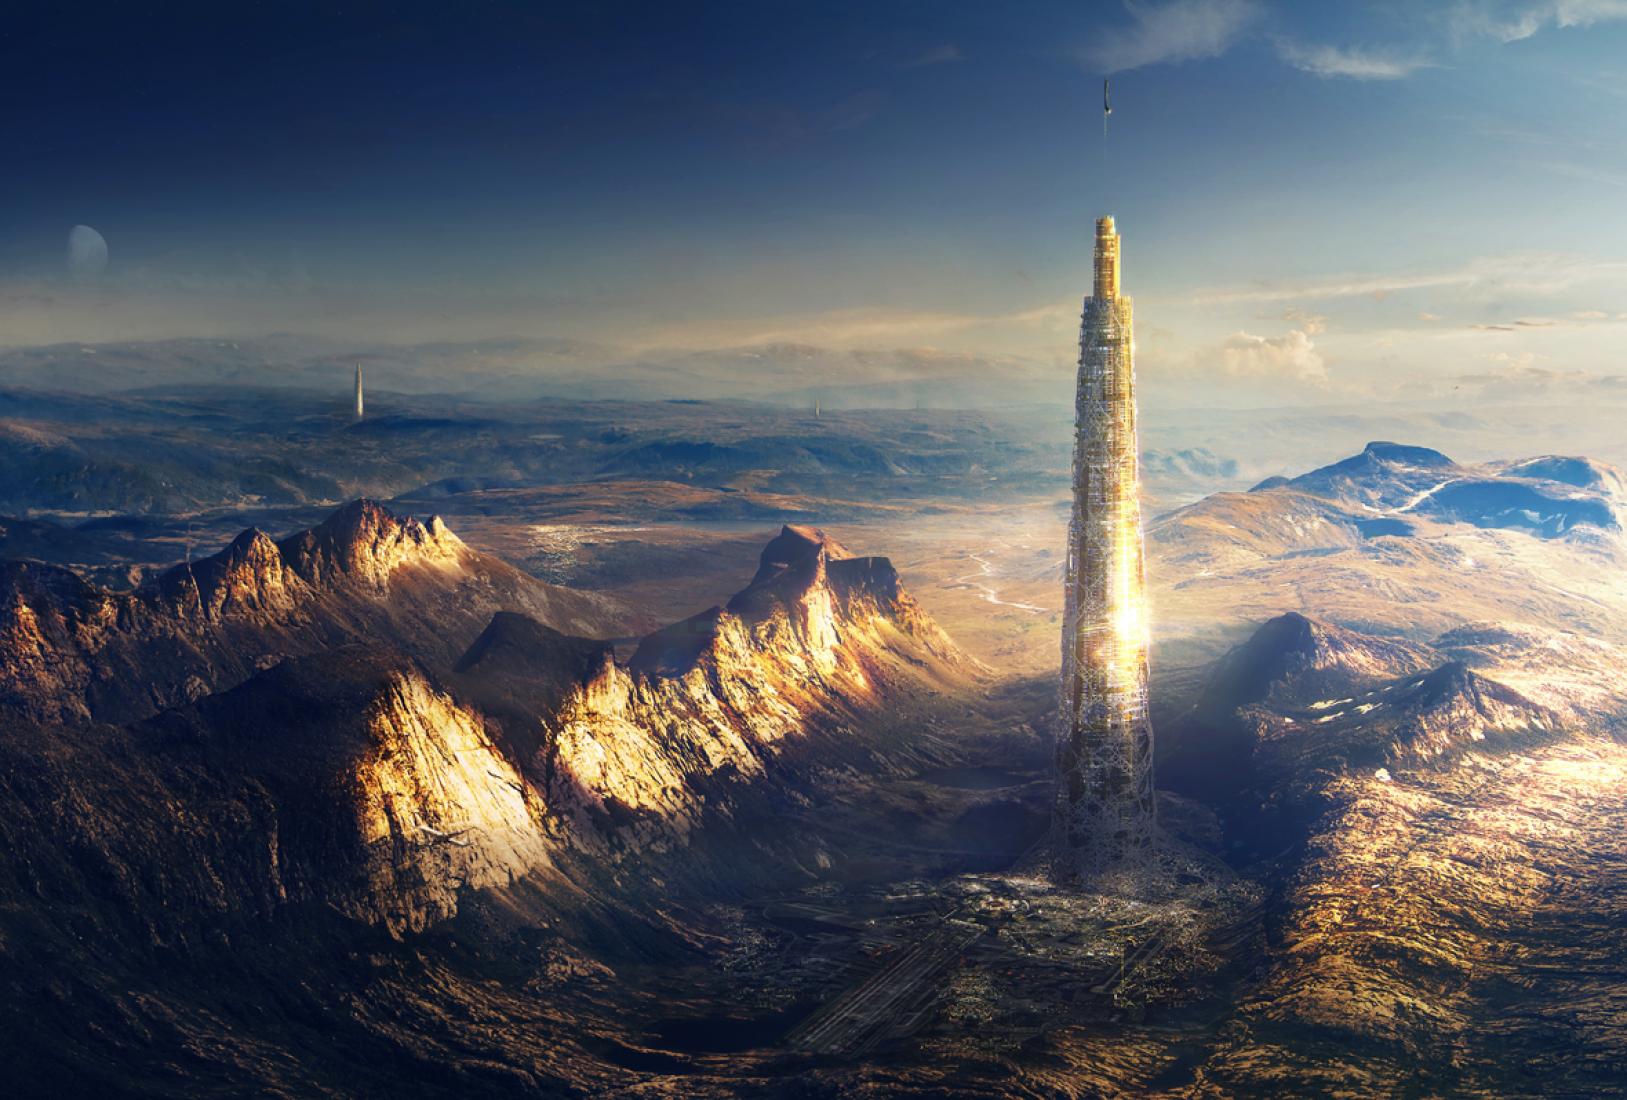 Launchspire Skyscraper, 2014. Photography © Henry Smith, Adam Woodward, Paul Attkins.